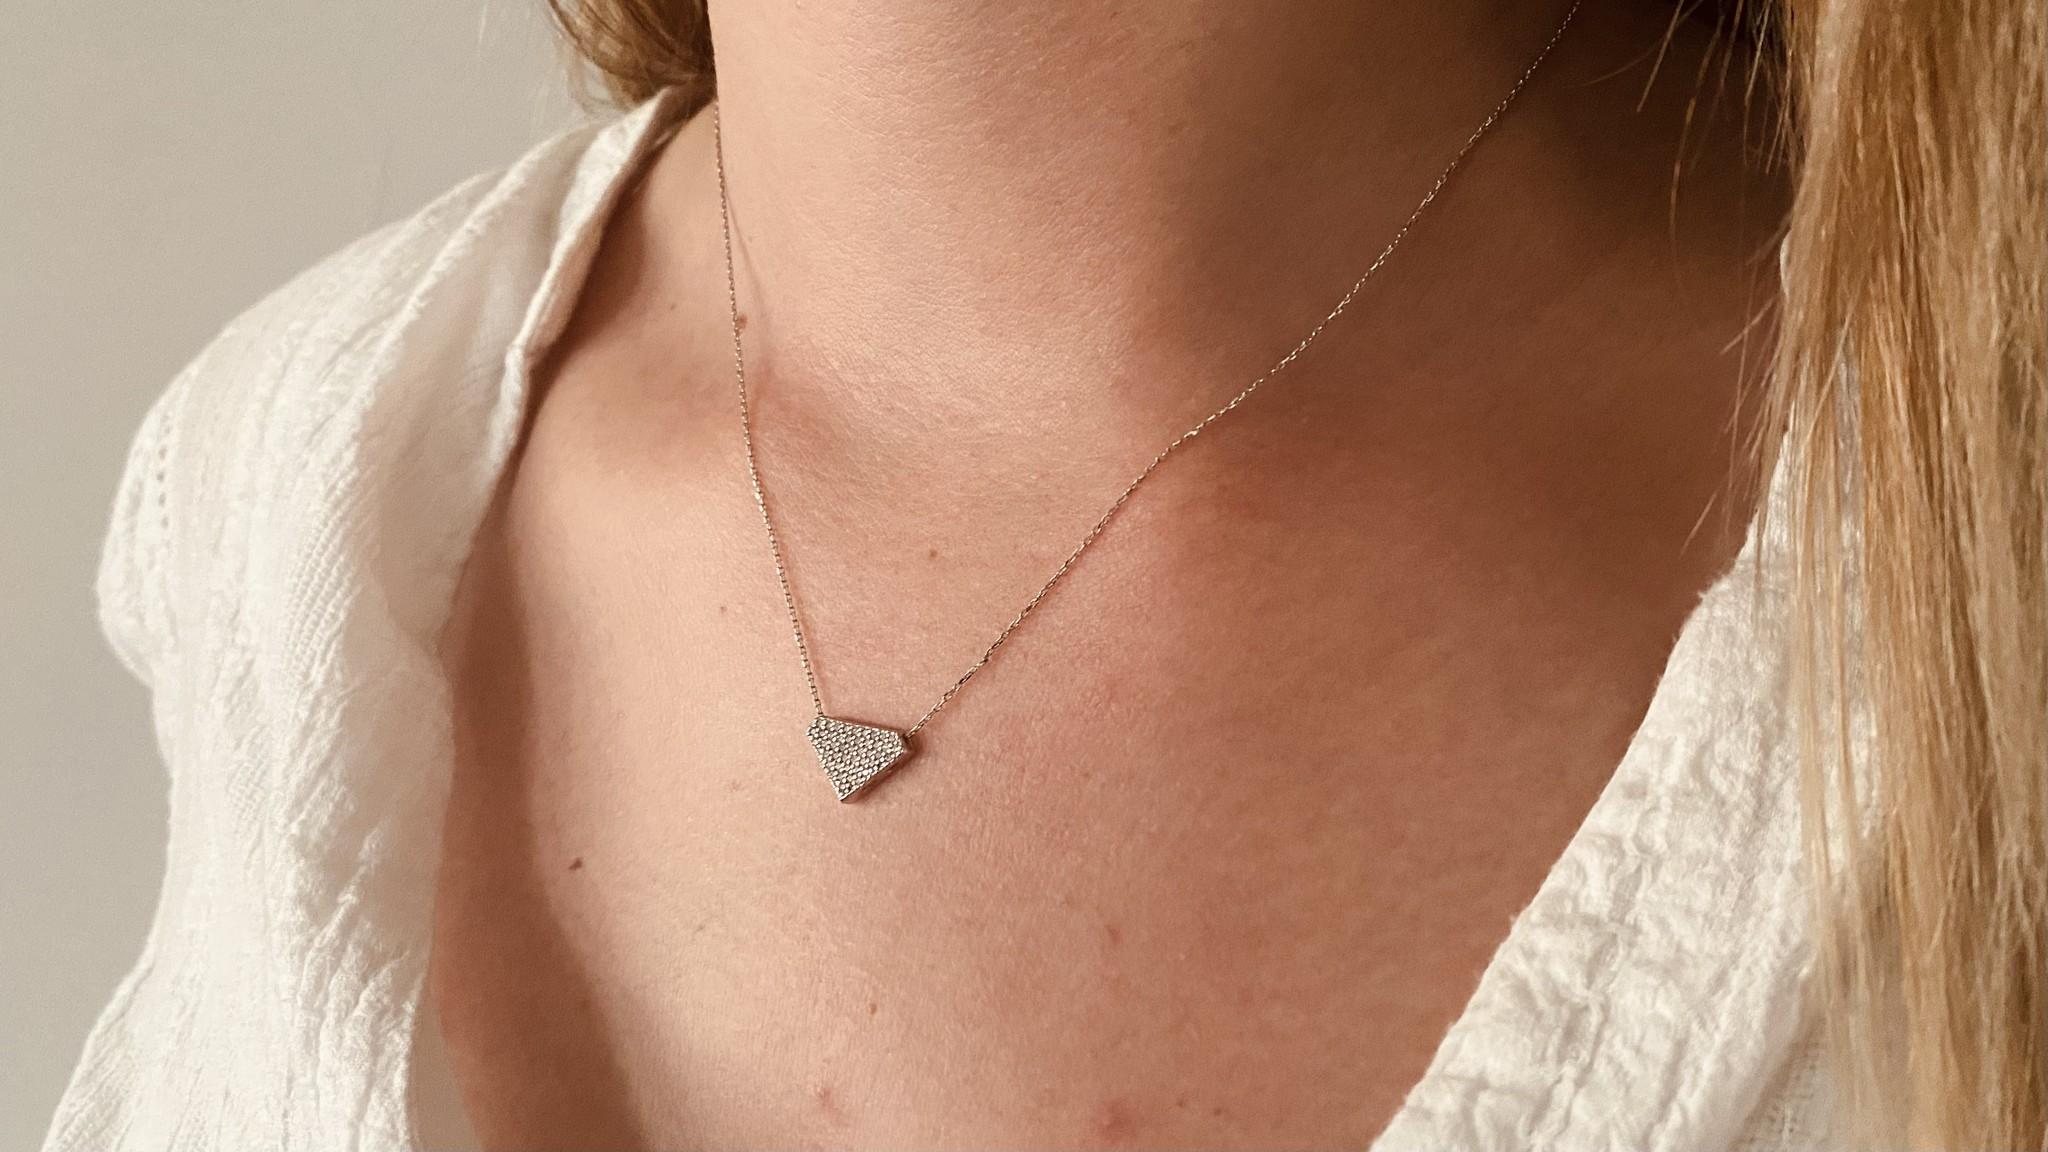 Ketting met vaste hanger diamantvorm witgoud-1